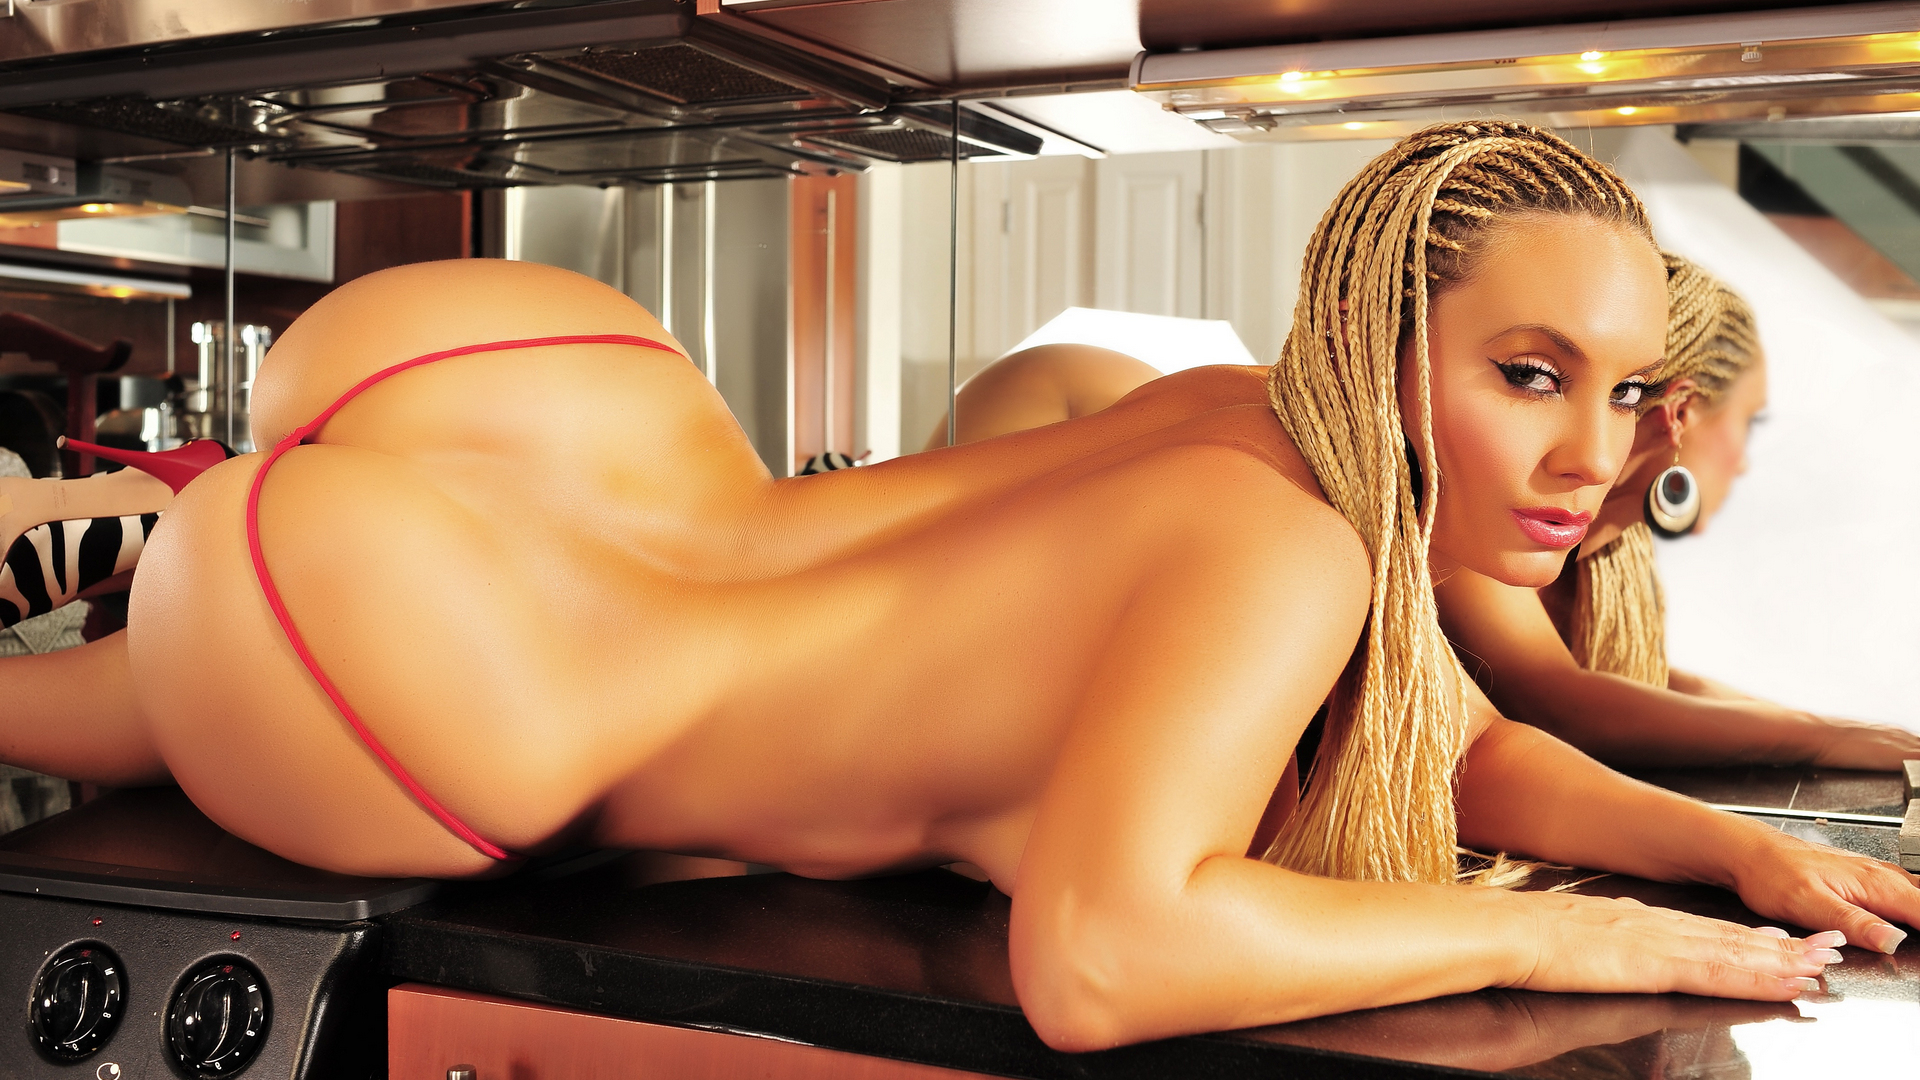 Nicole Coco Austin Nude Leaked Photos Nude Celebrity Photos